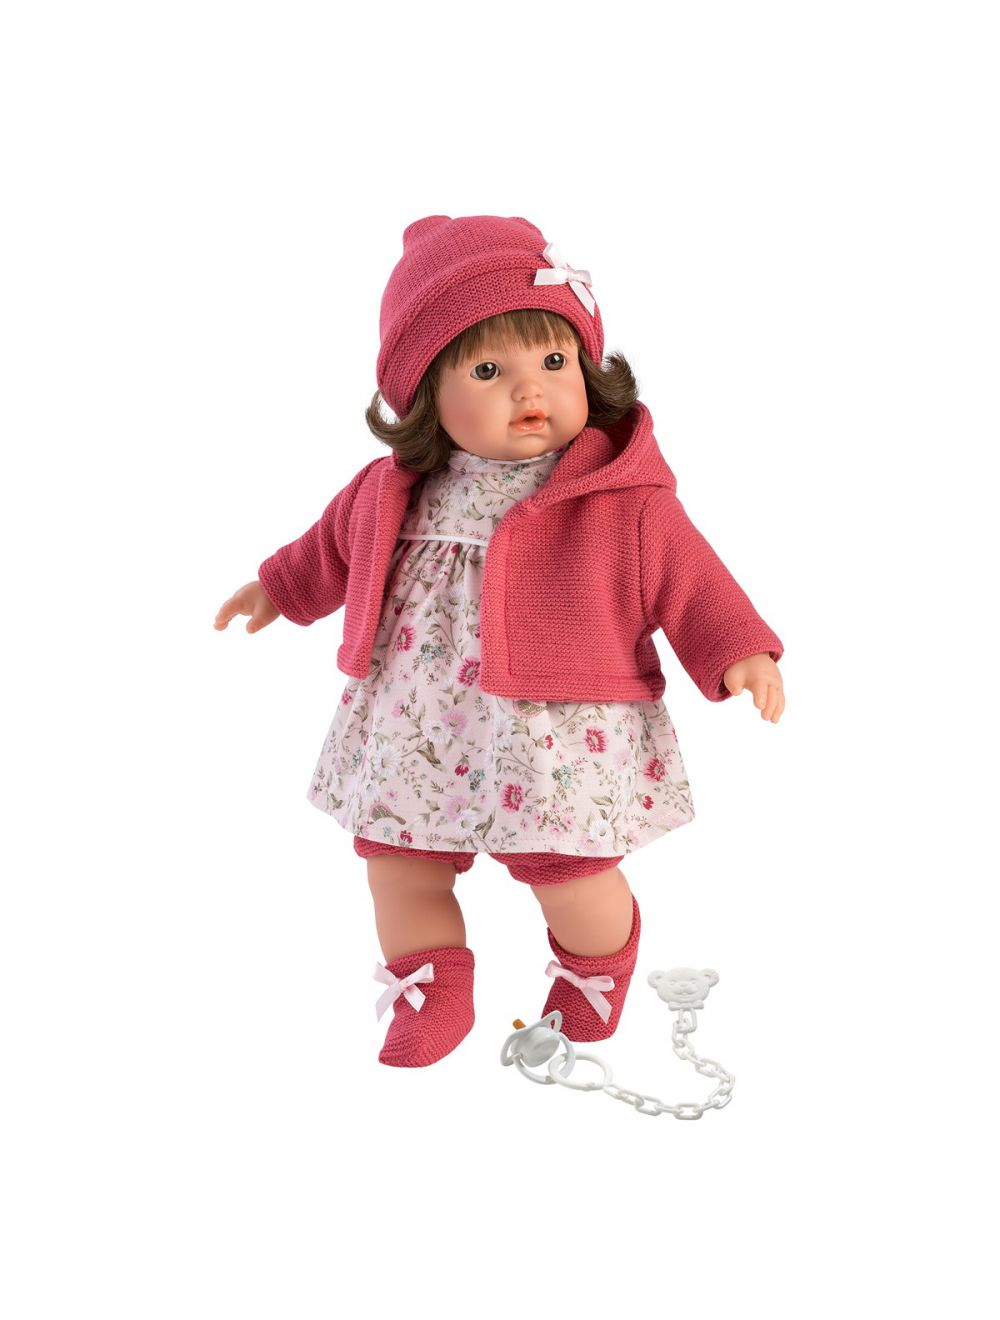 Llorens 33330 Lalka płacząca Aysel 33 cm różowa brunetka